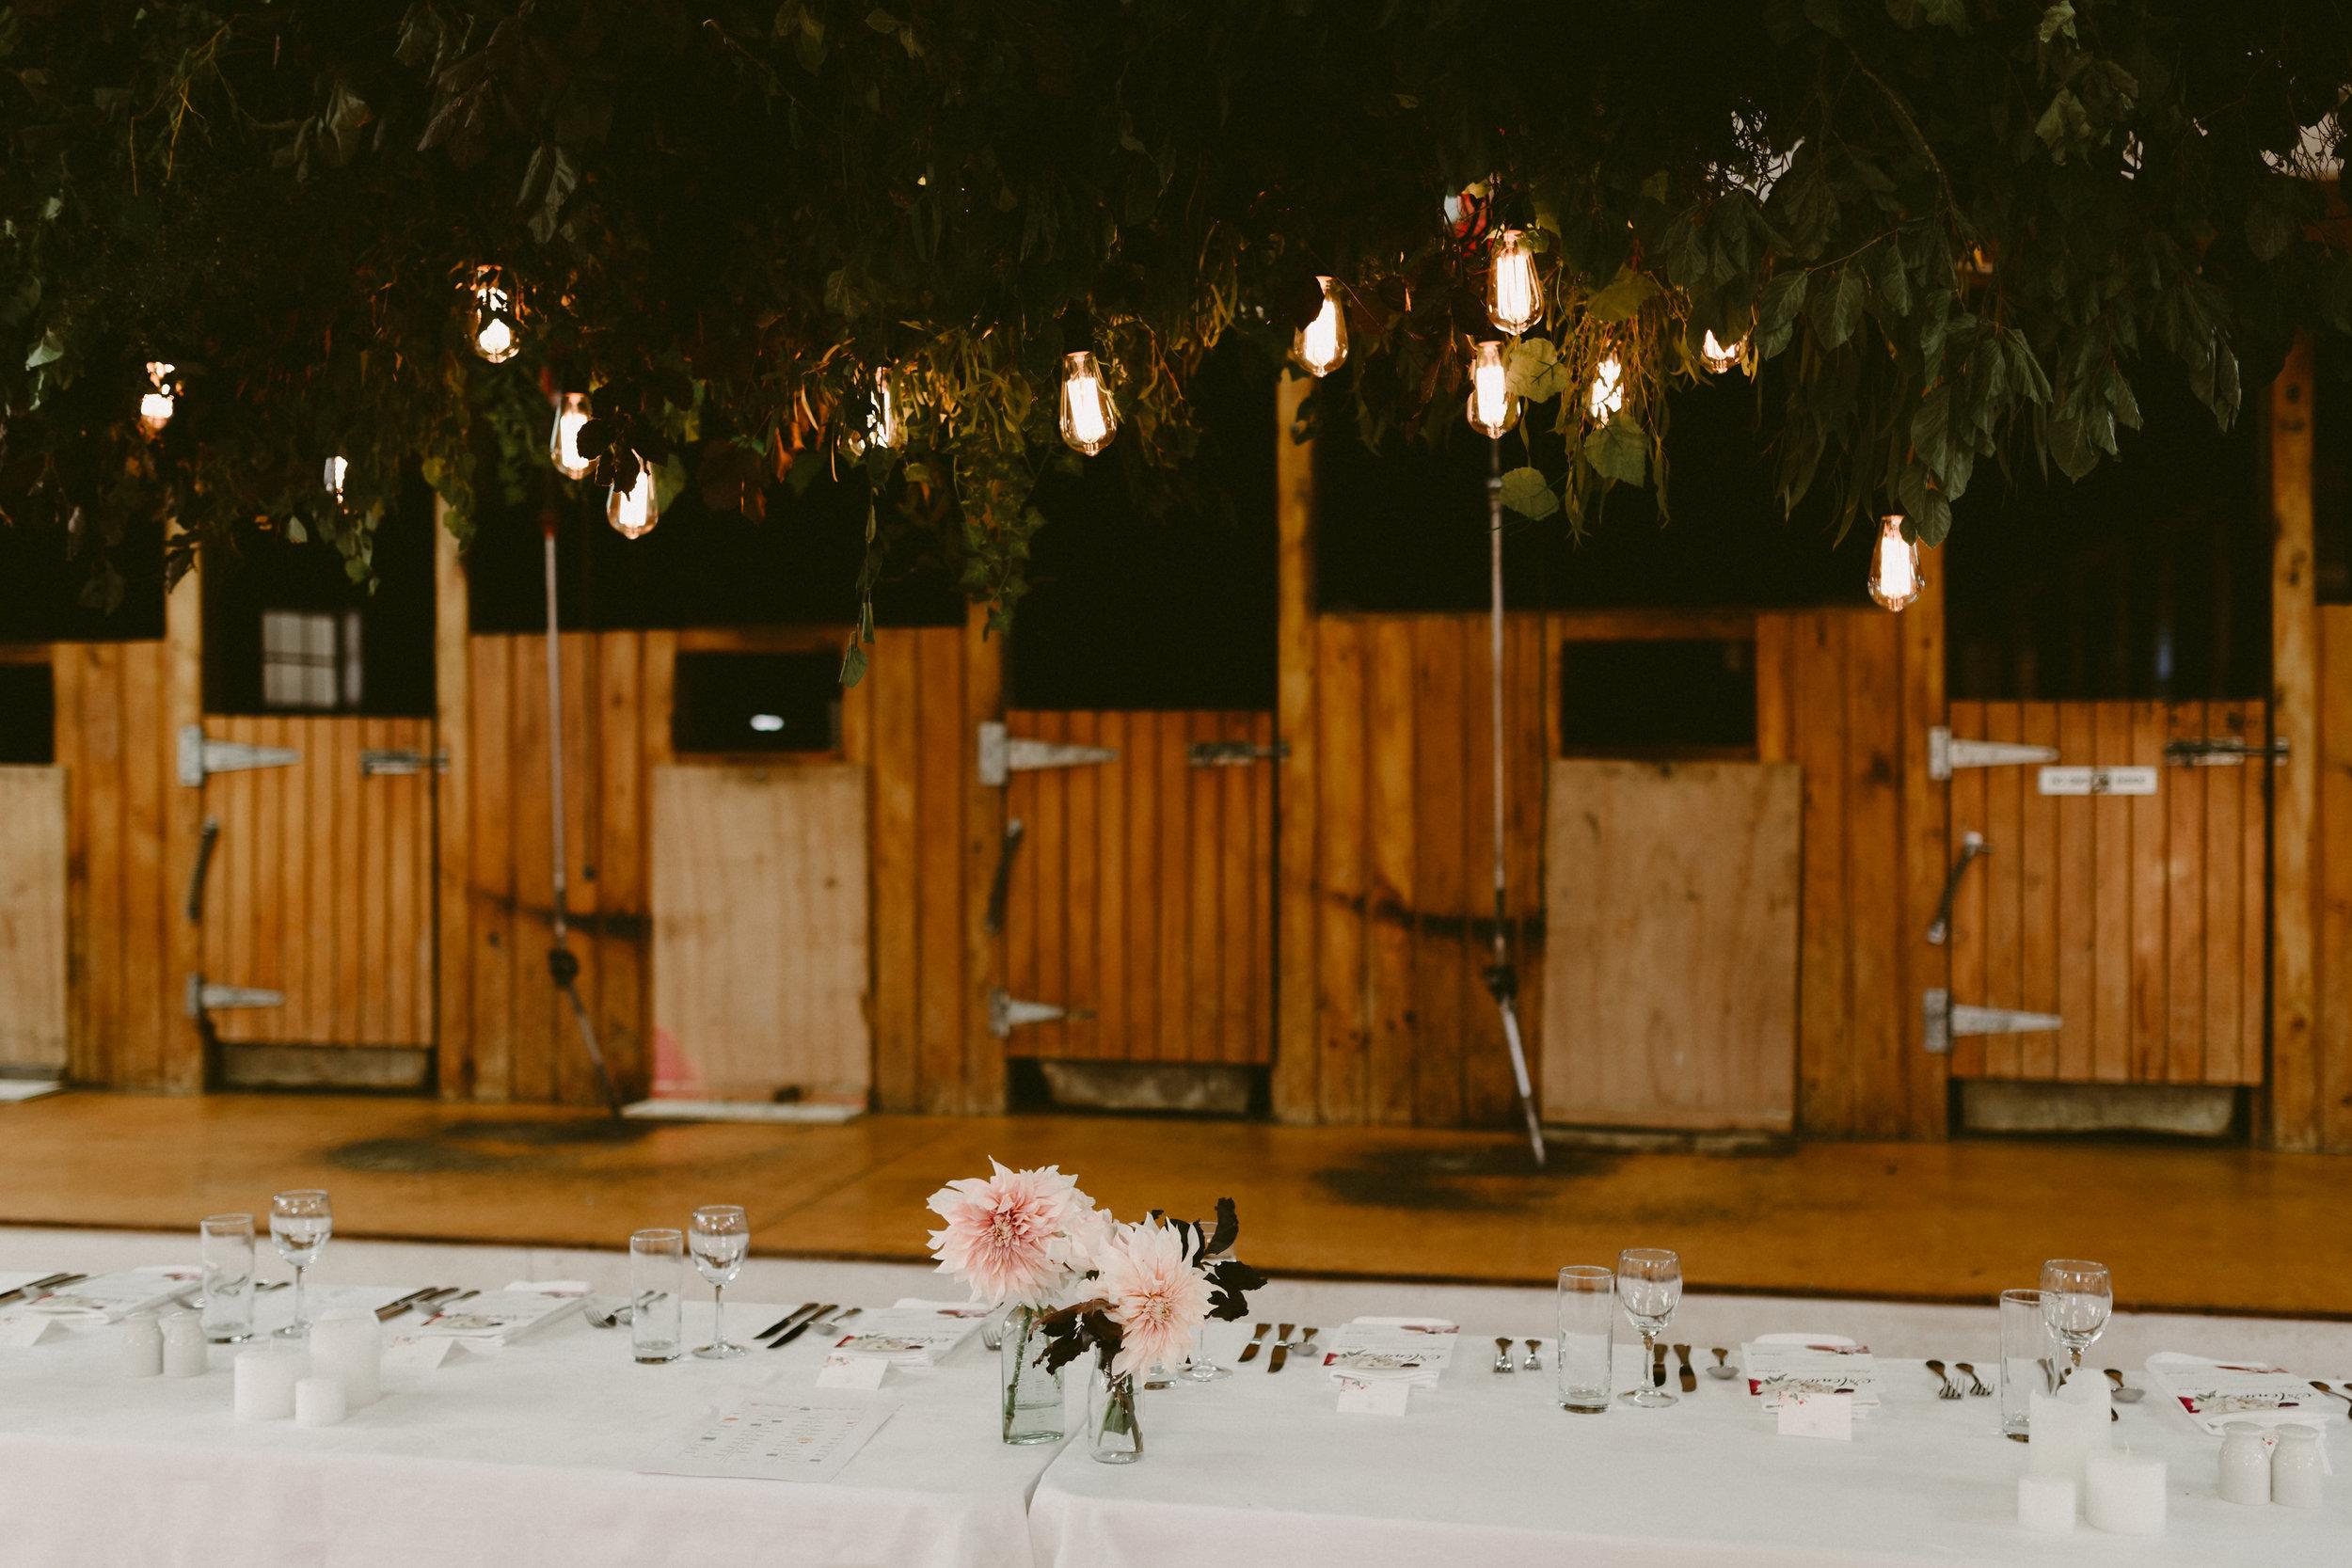 emiily_gary_mt_nic_wedding-122.jpg